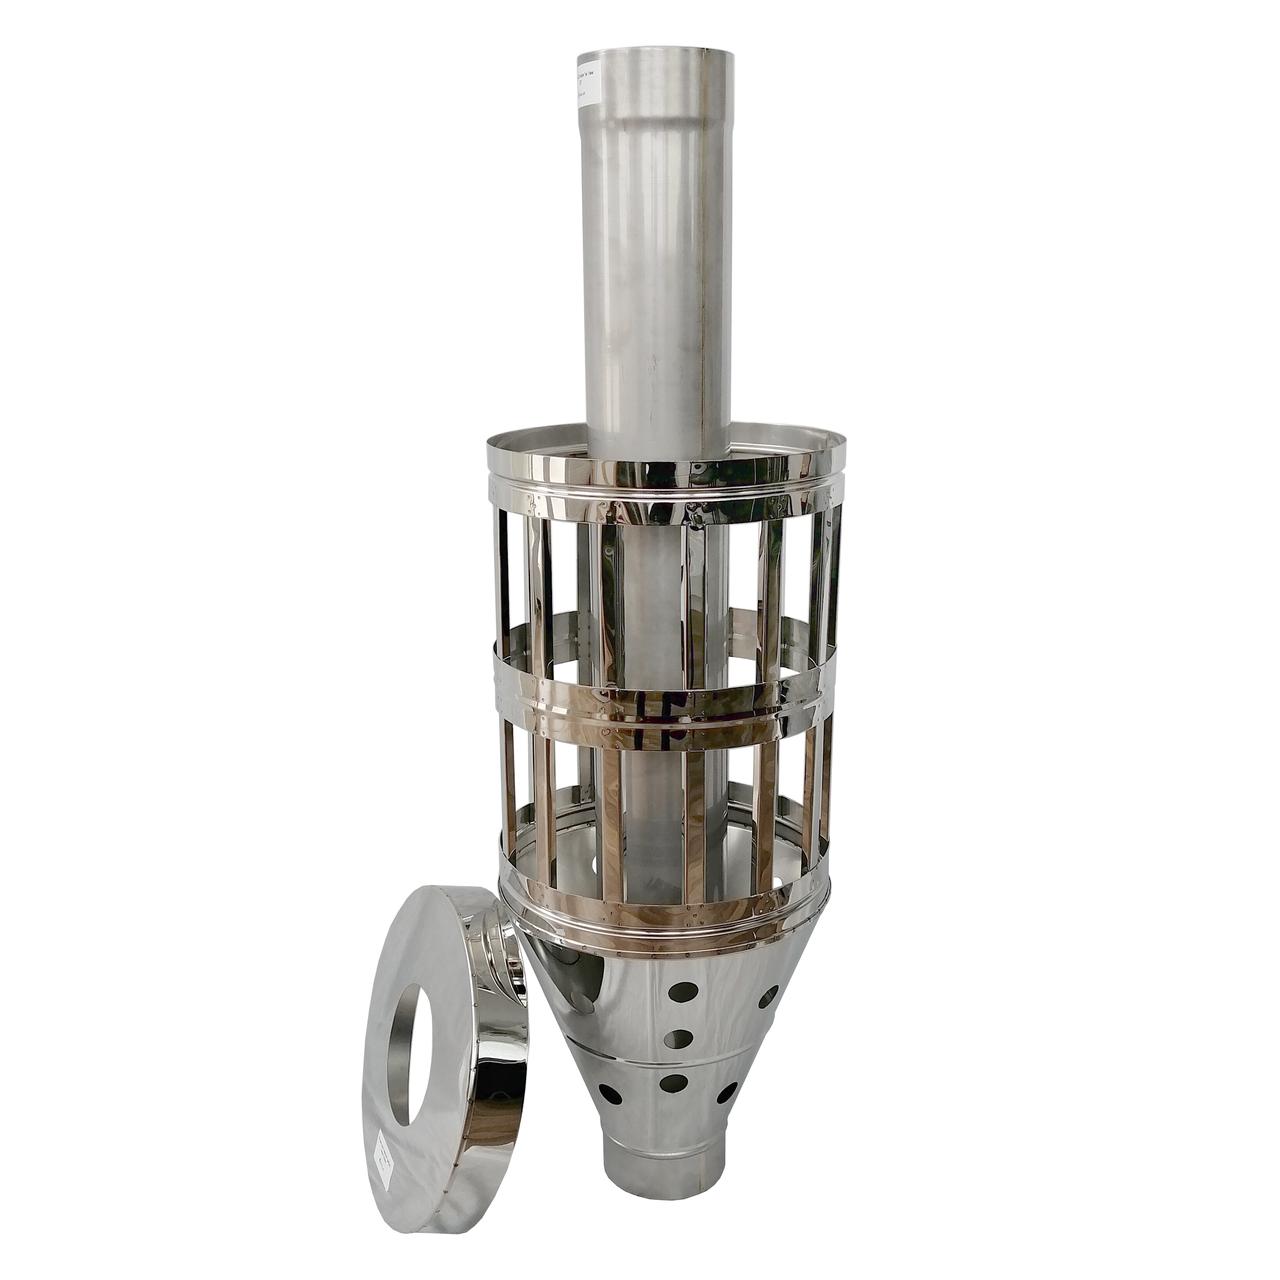 Труба-корзина (ребро) ø110 мм 1 мм 1 метр AISI 321 Stalar для камней дымохода сауны бани из нержавеющей стали